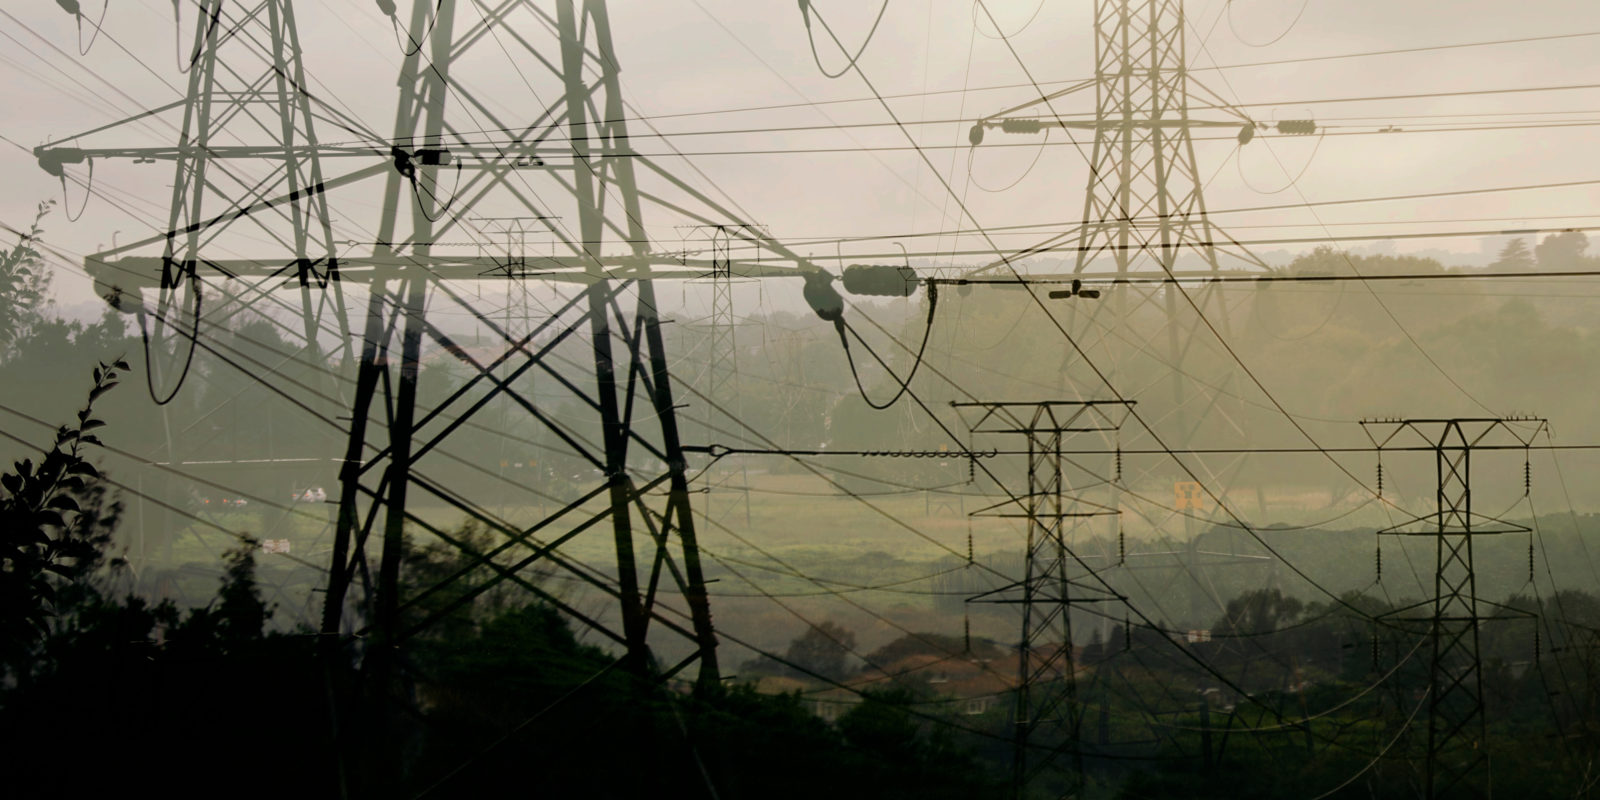 Eskom: For experts in energy, it's hopelessly grim, o